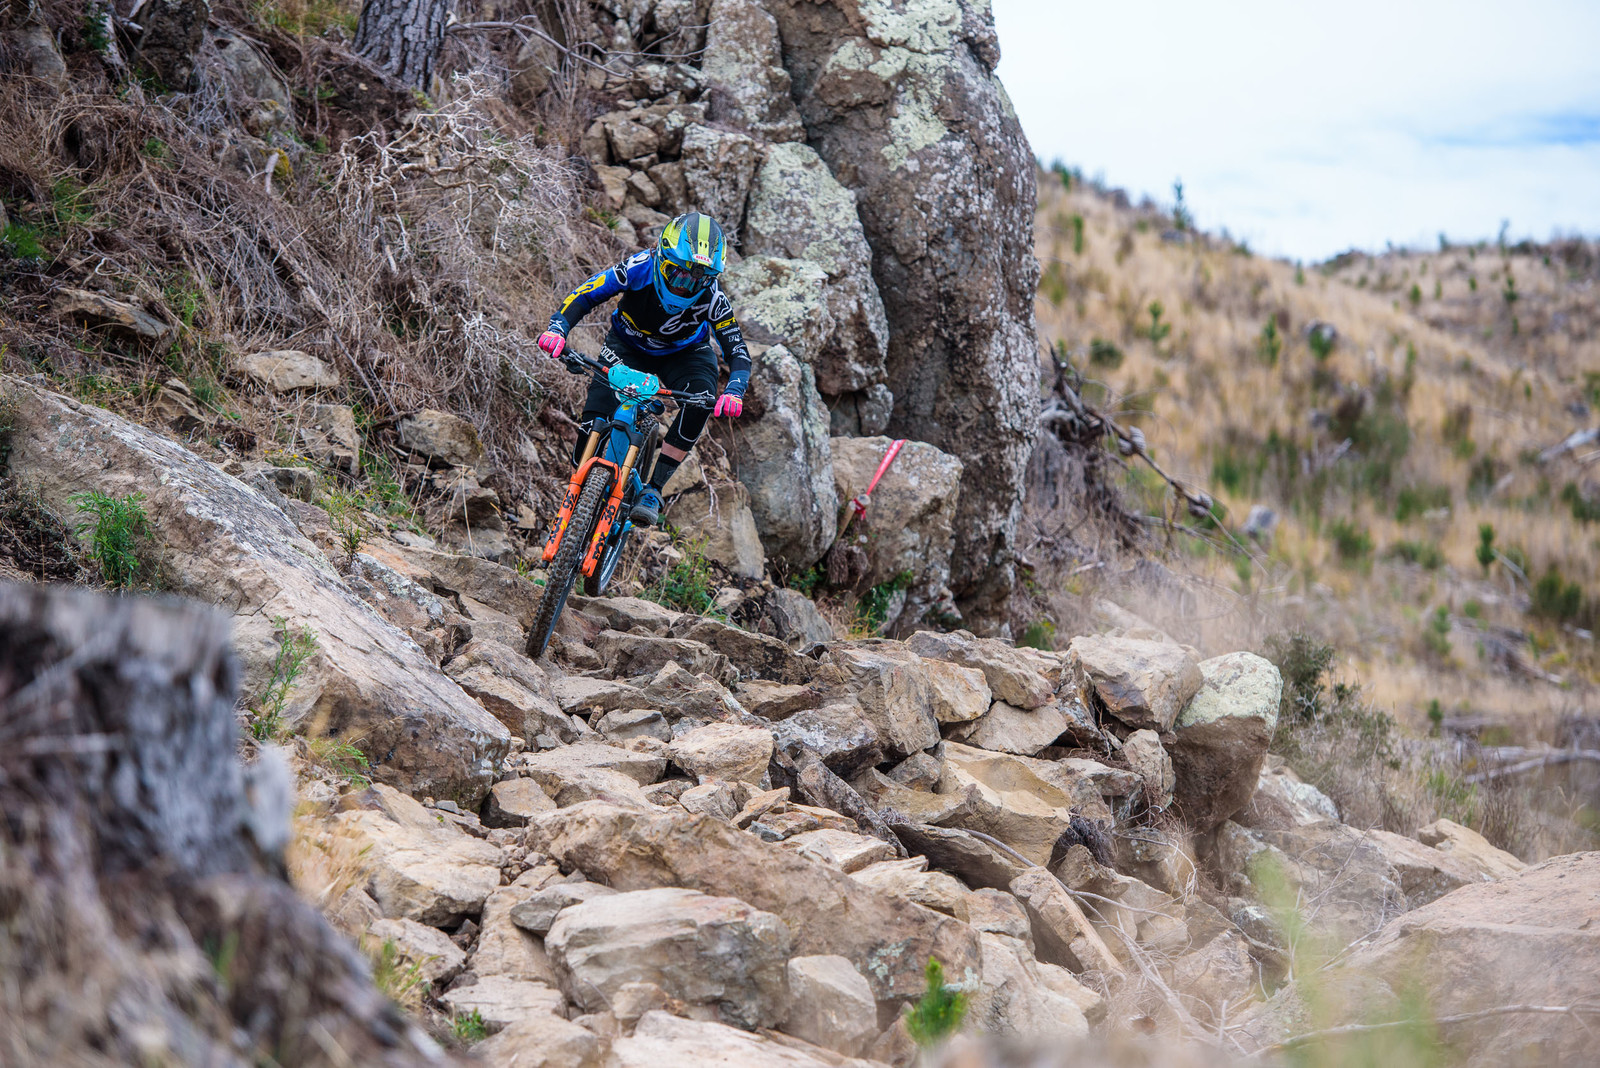 NZenduro19 day 3 DShaw-8540 - 2019 NZ Enduro Day 3 Photo Gallery - Mountain Biking Pictures - Vital MTB